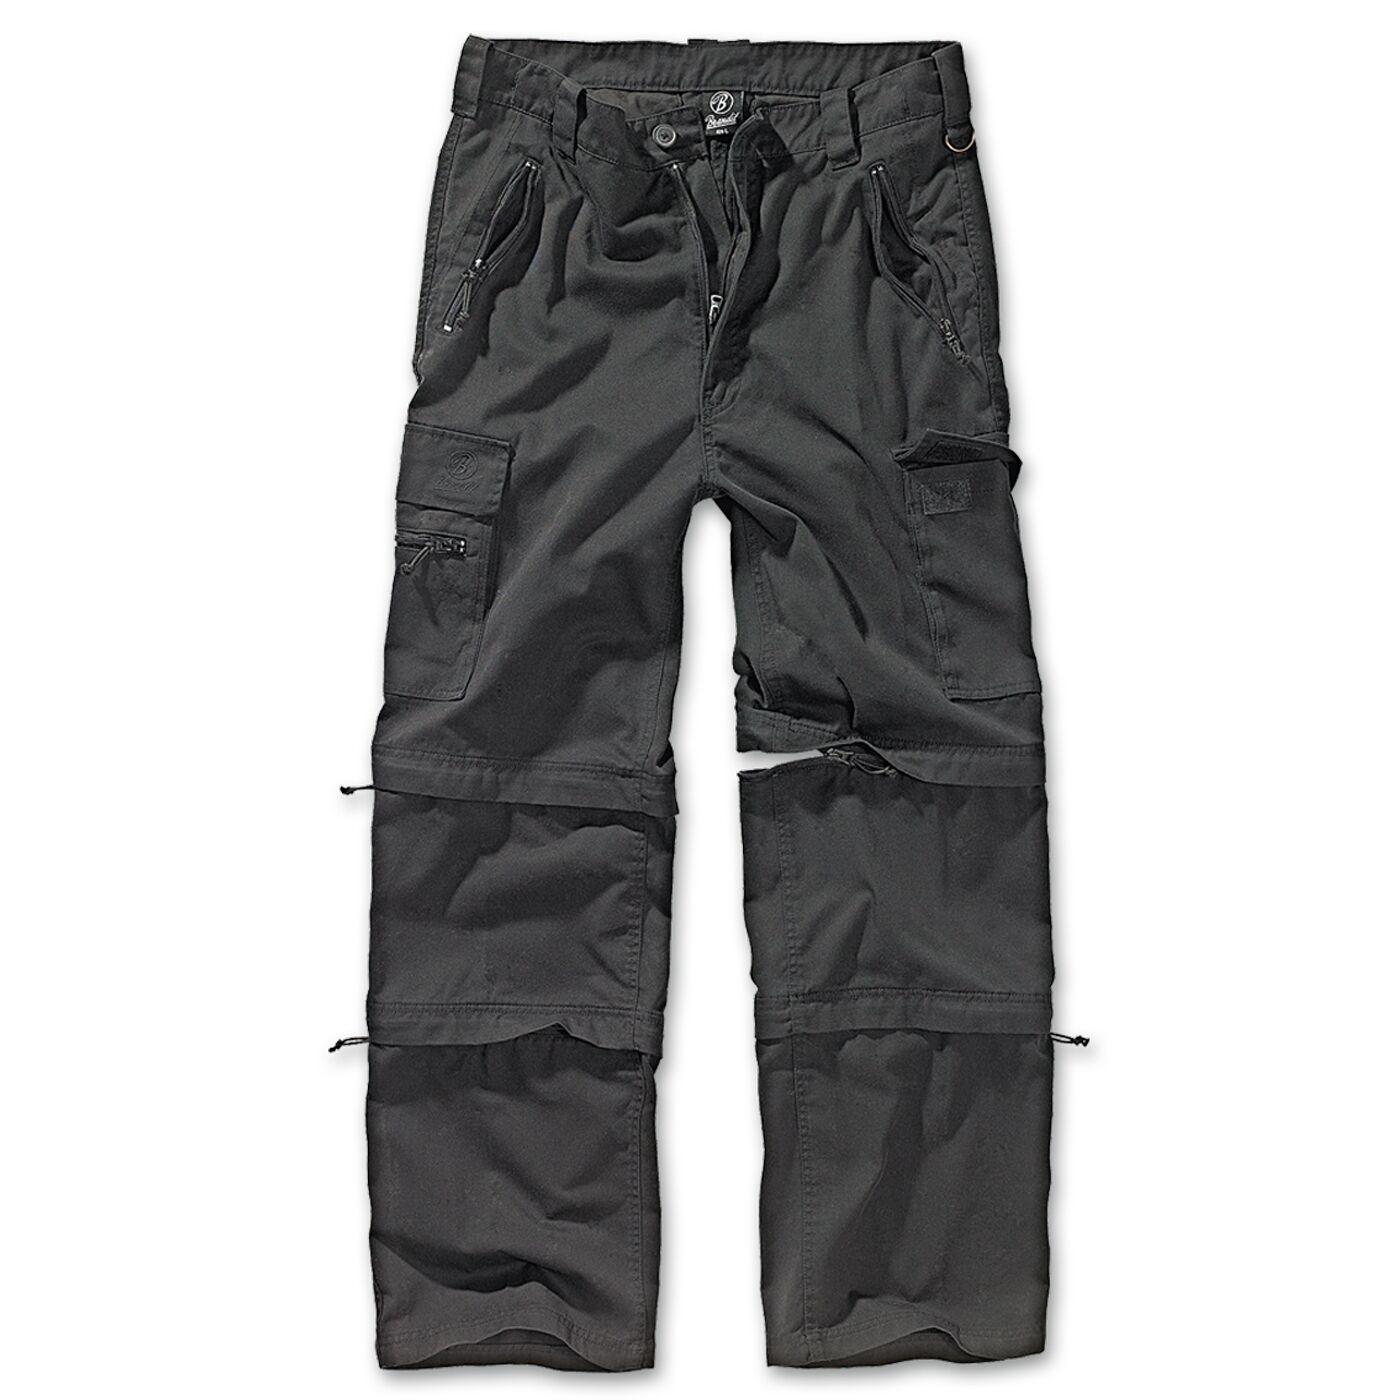 Brandit - SAVANA savannahtrekking Trouser Negro Pantalón Cargo trouser de hombre trouser Cargo 9a6c57